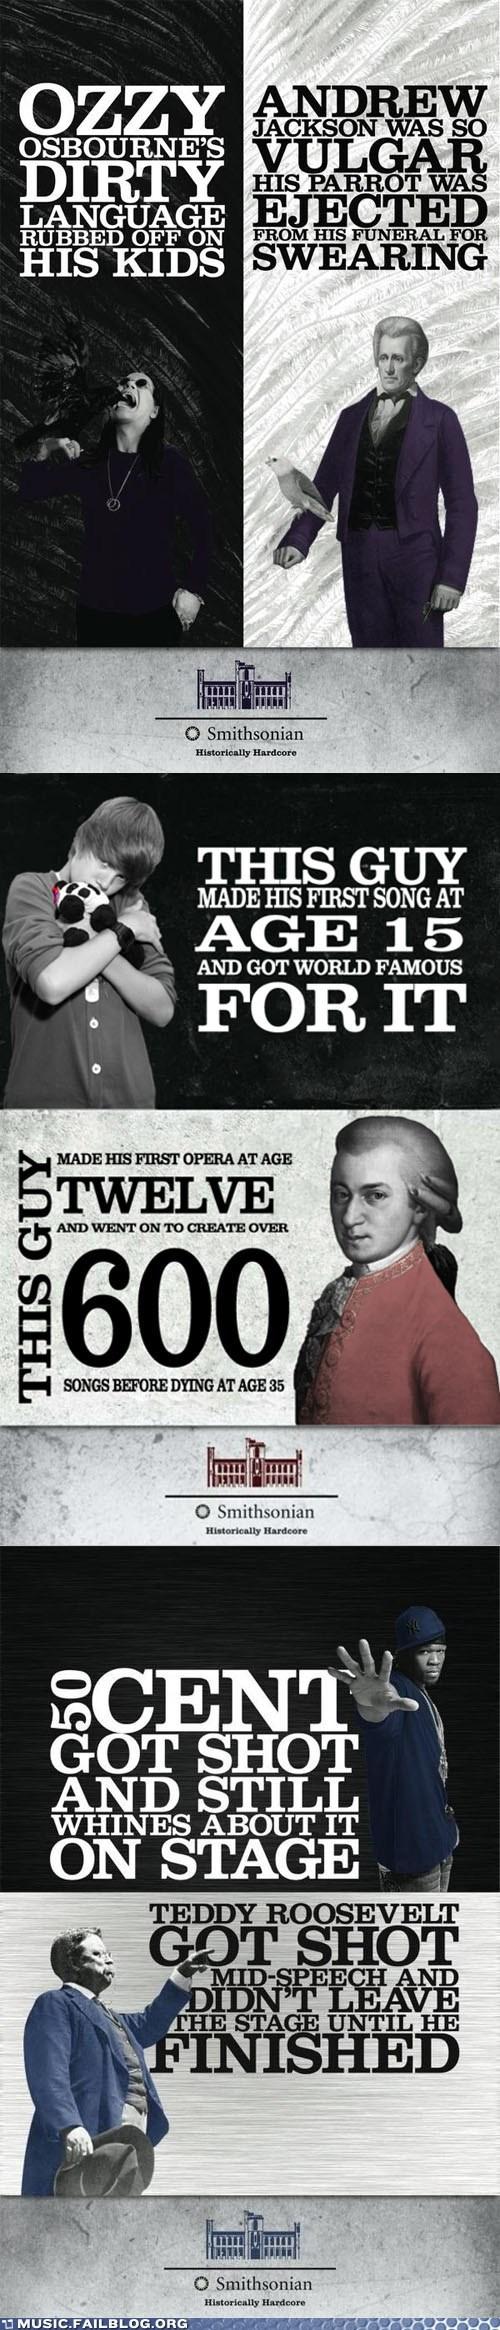 50 cent Andrew Jackson black sabbath history justin bieber mozart Ozzy Osbourne Smithsonian teddy roosevelt - 6411164928